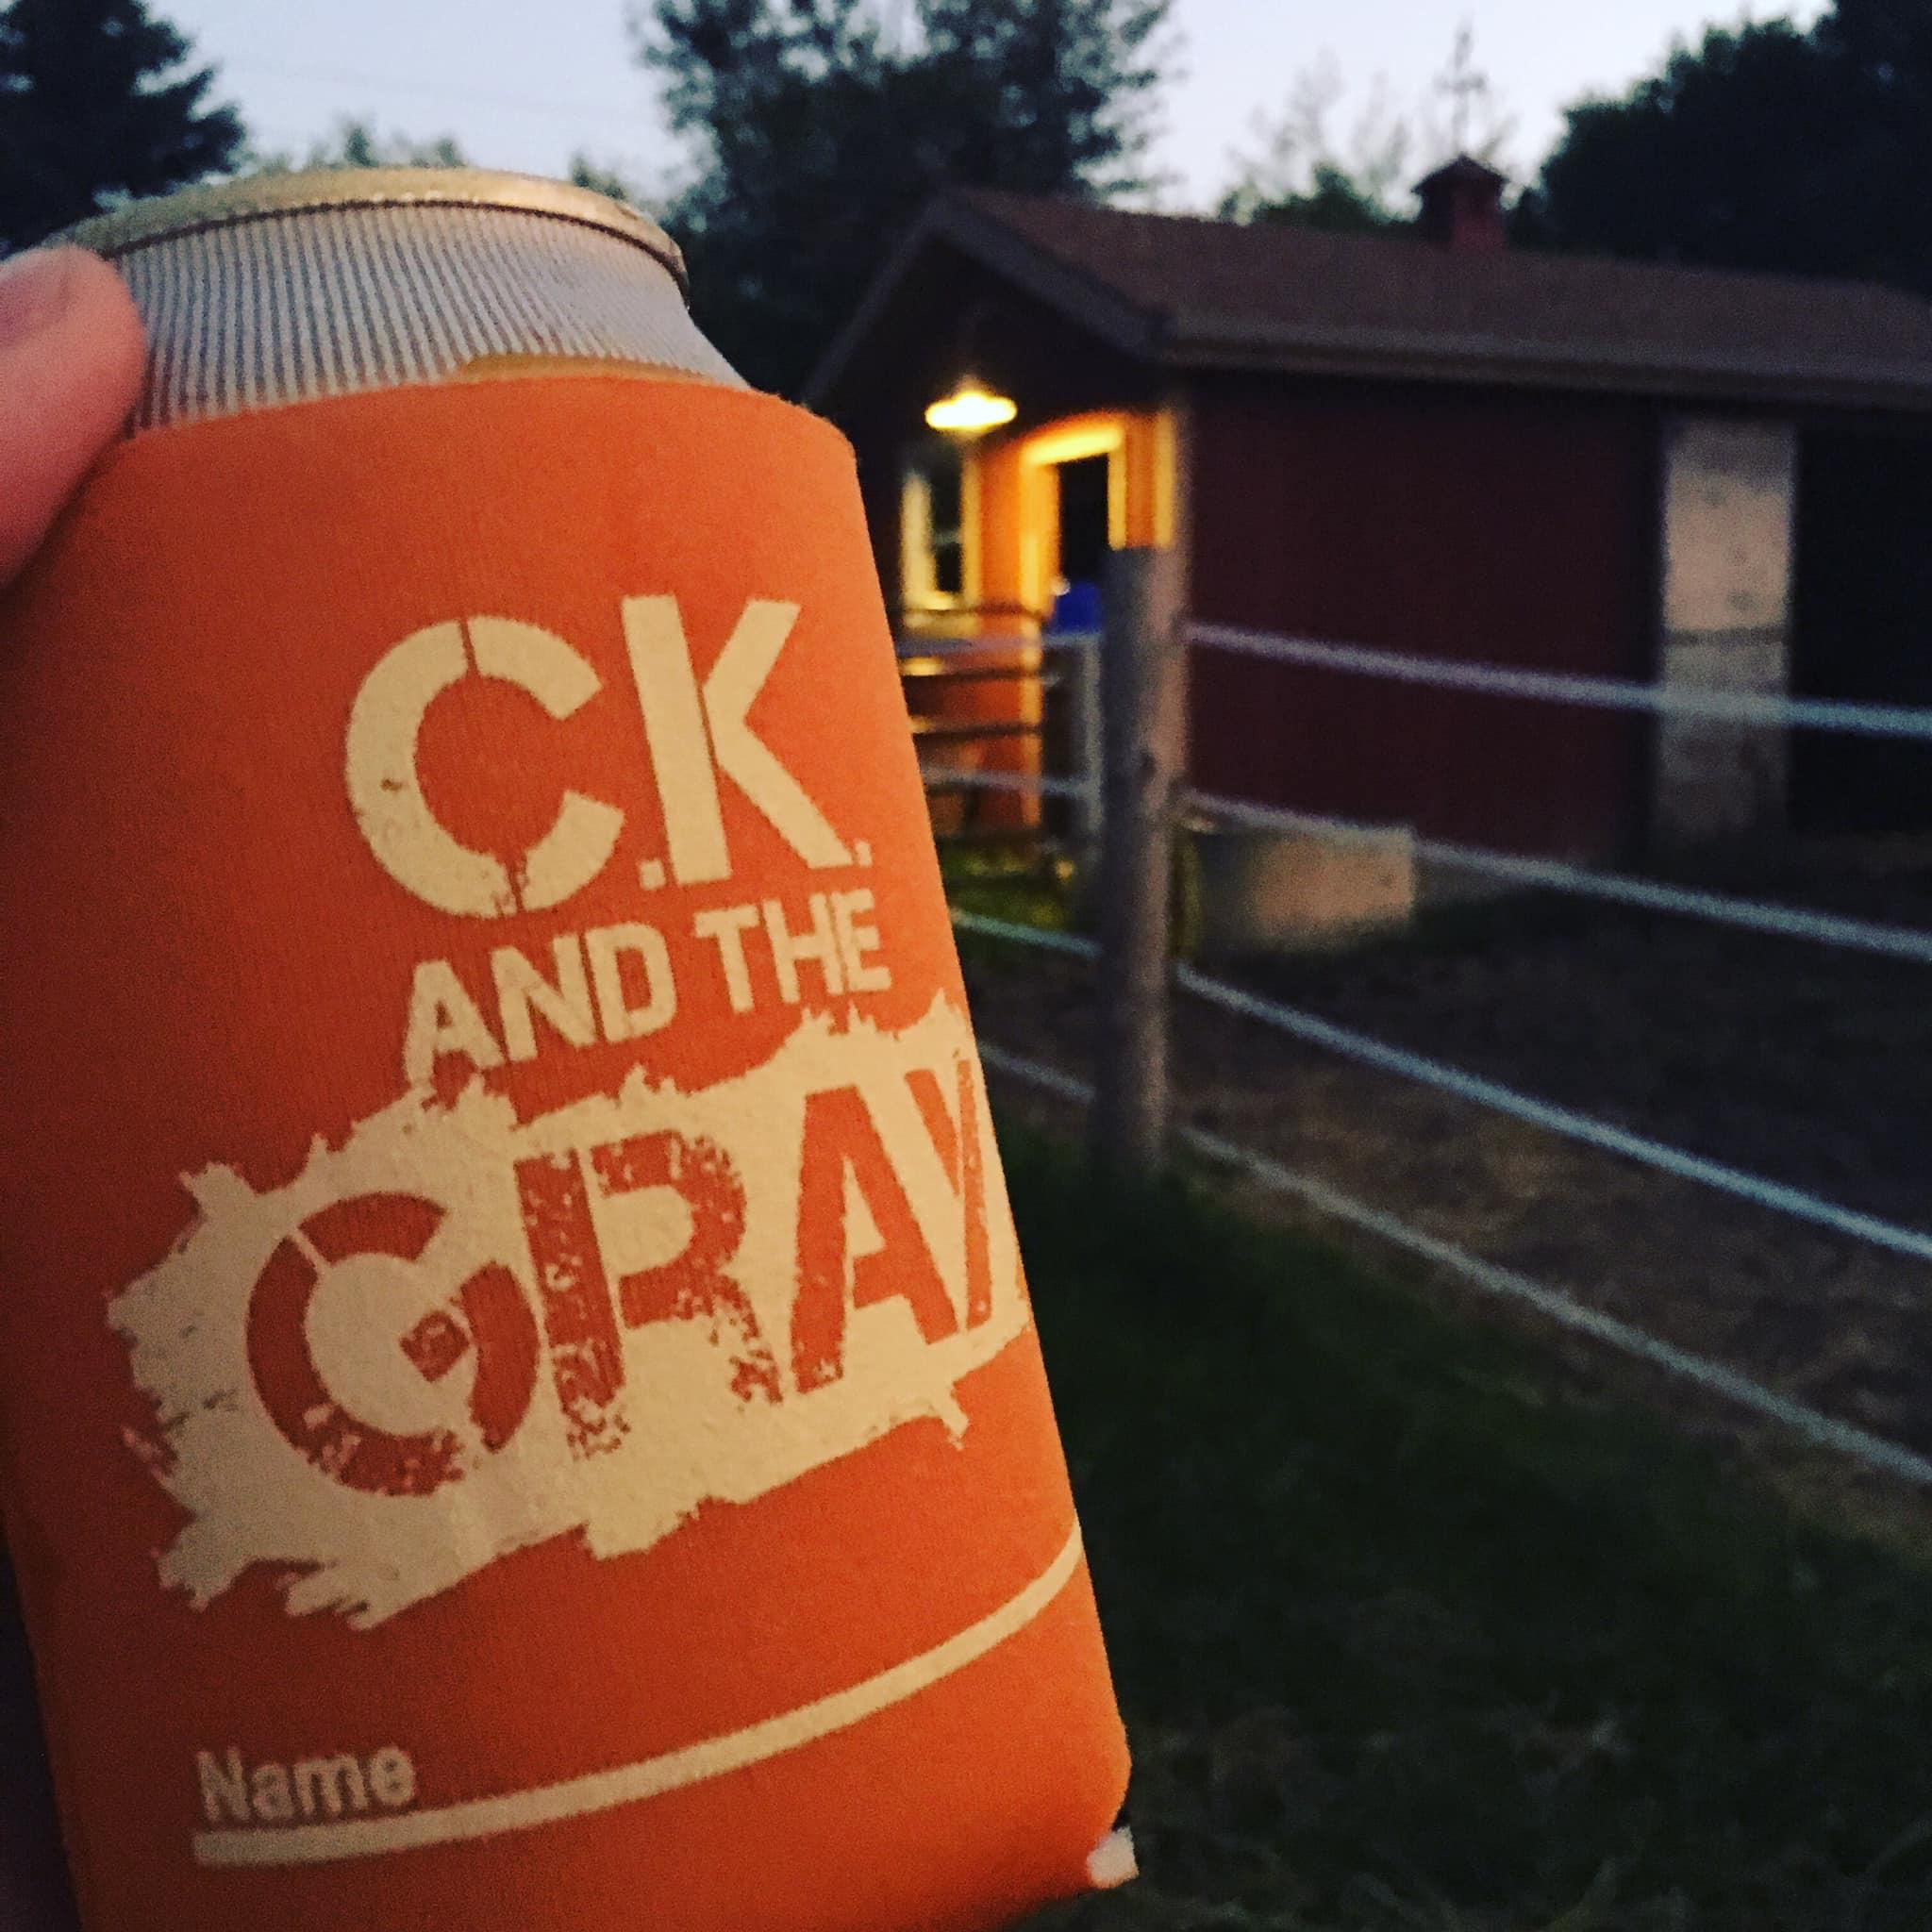 Summer Nights with #ckcancooler